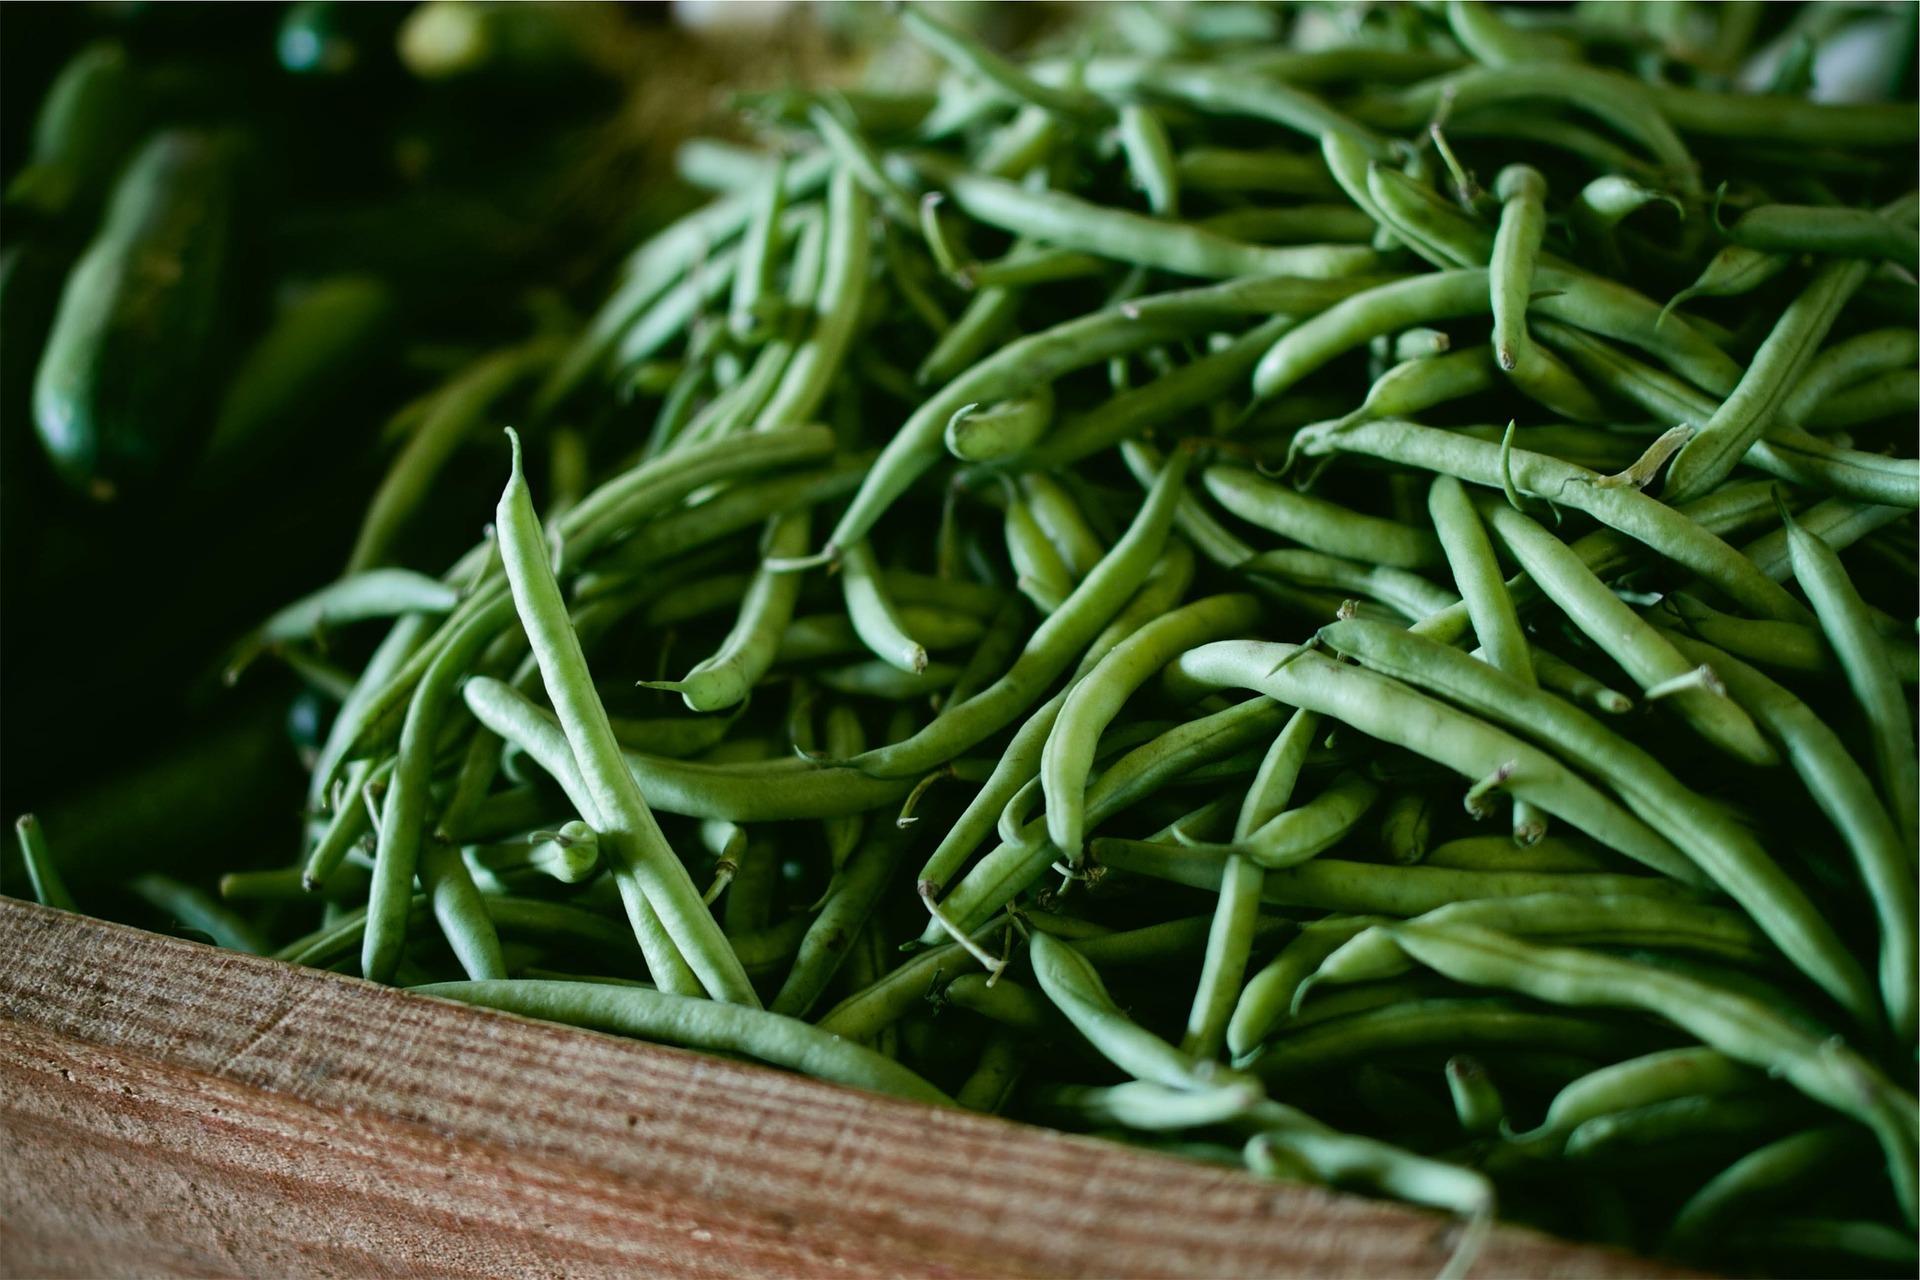 farm-fresh-green-beans-reston-farm-market-va-2.jpg